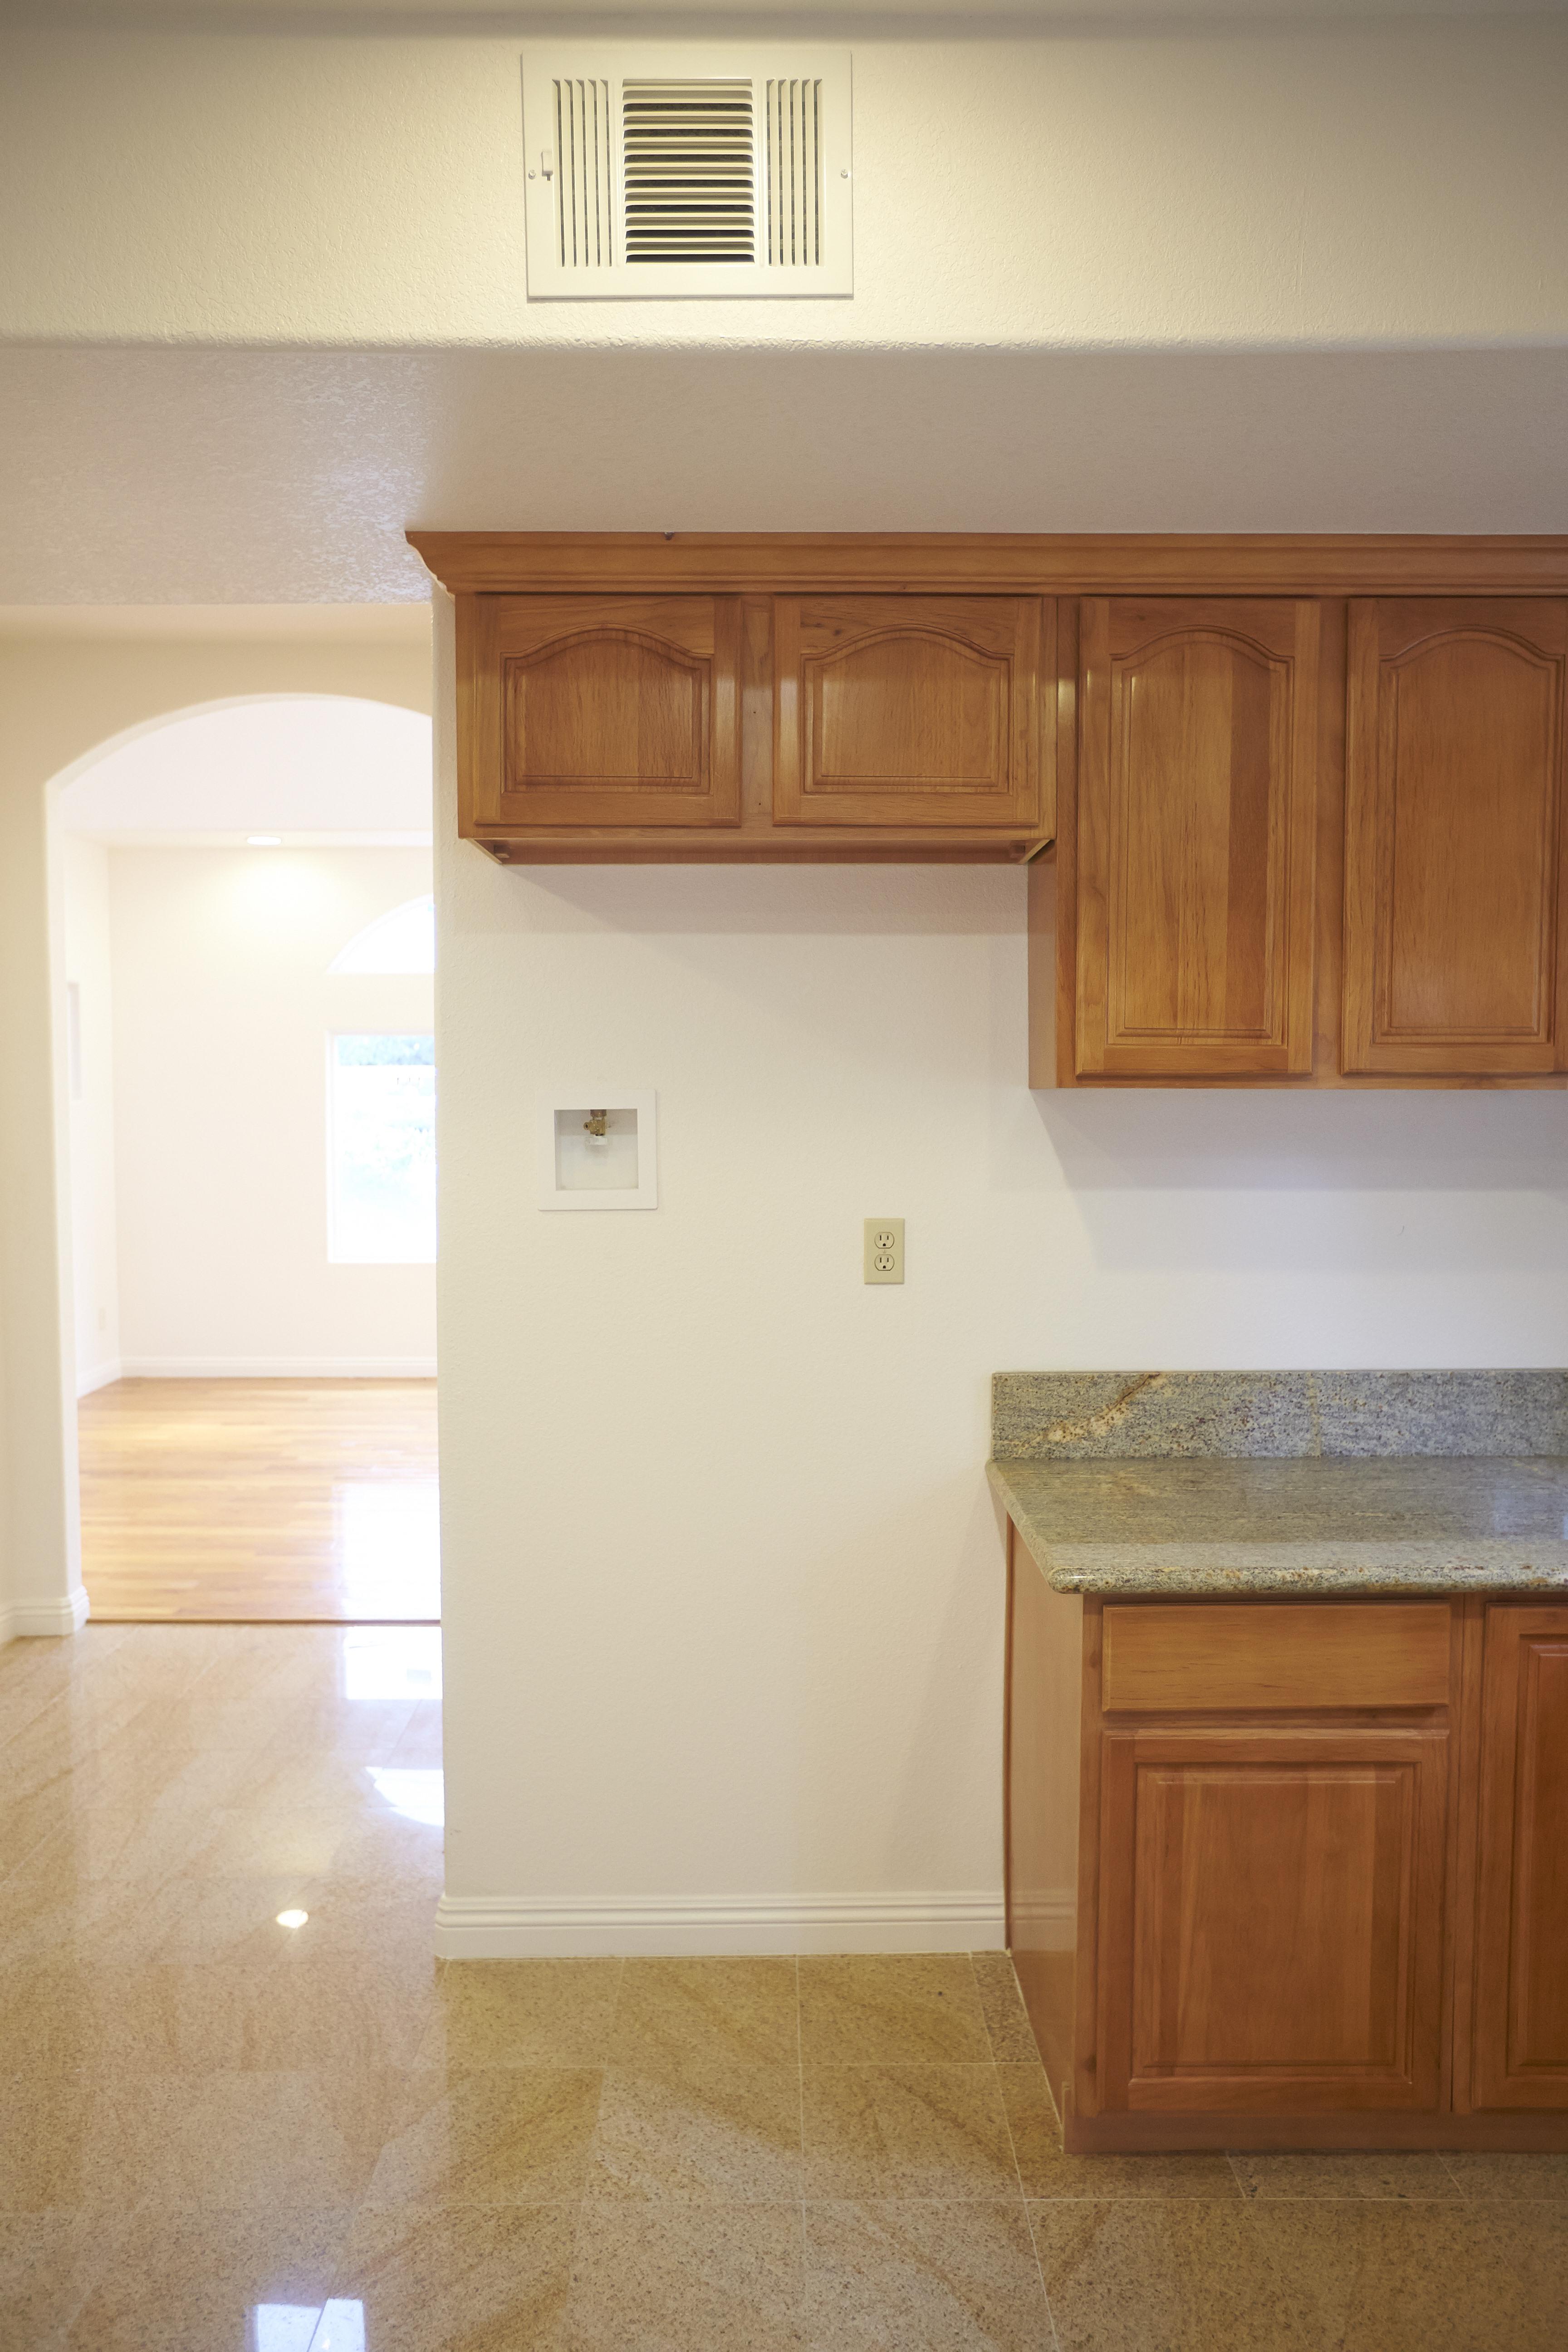 Refrigerator space